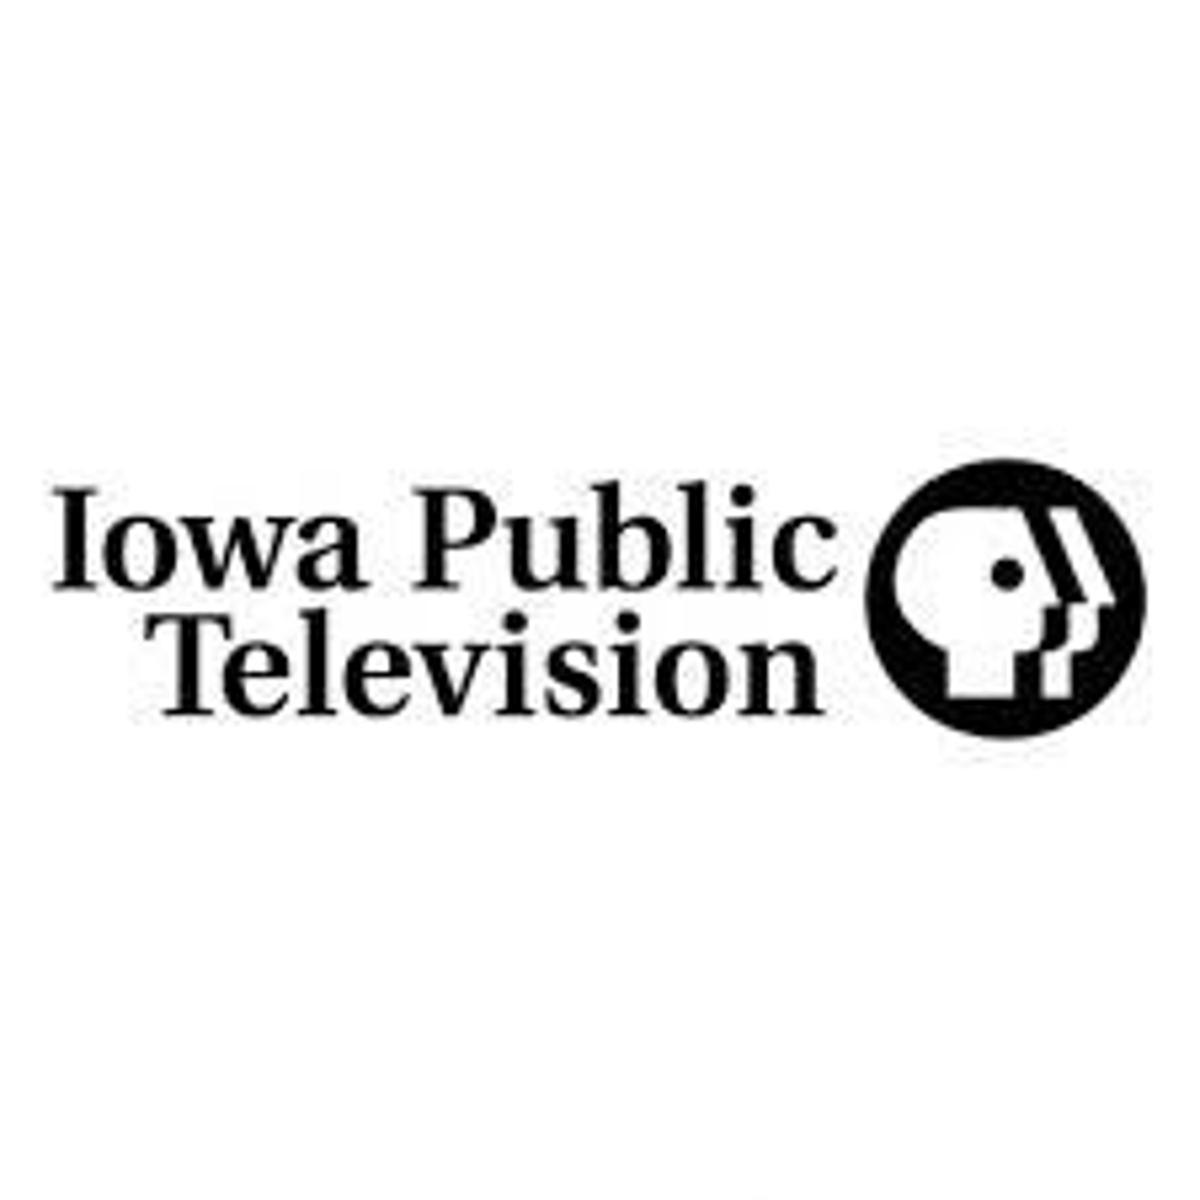 Iowa Public Television logo